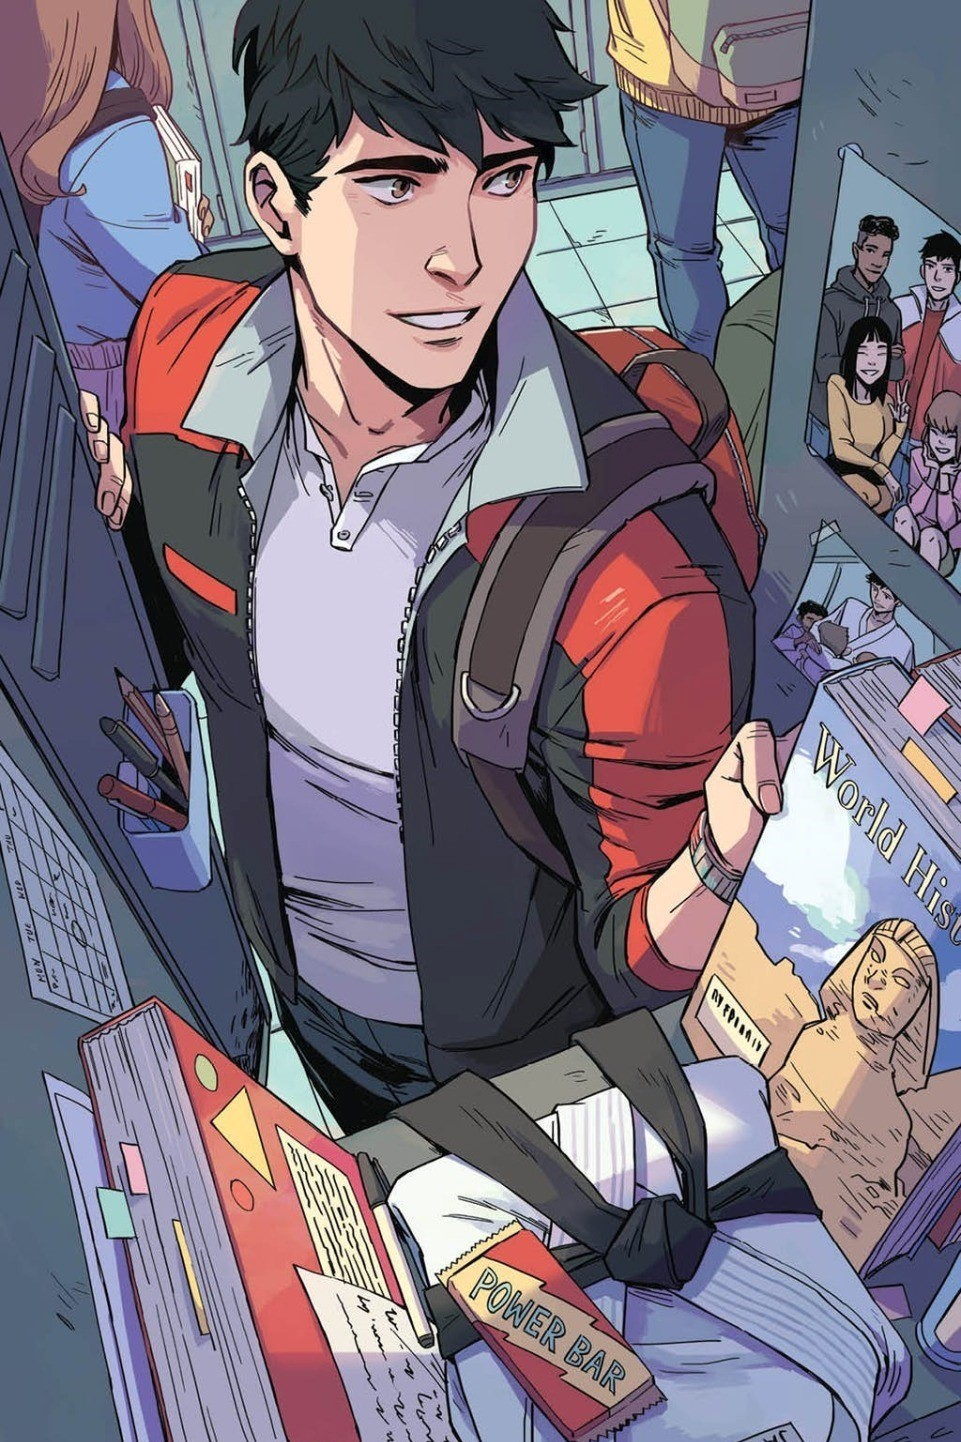 Jason Lee Scott/2016 comic